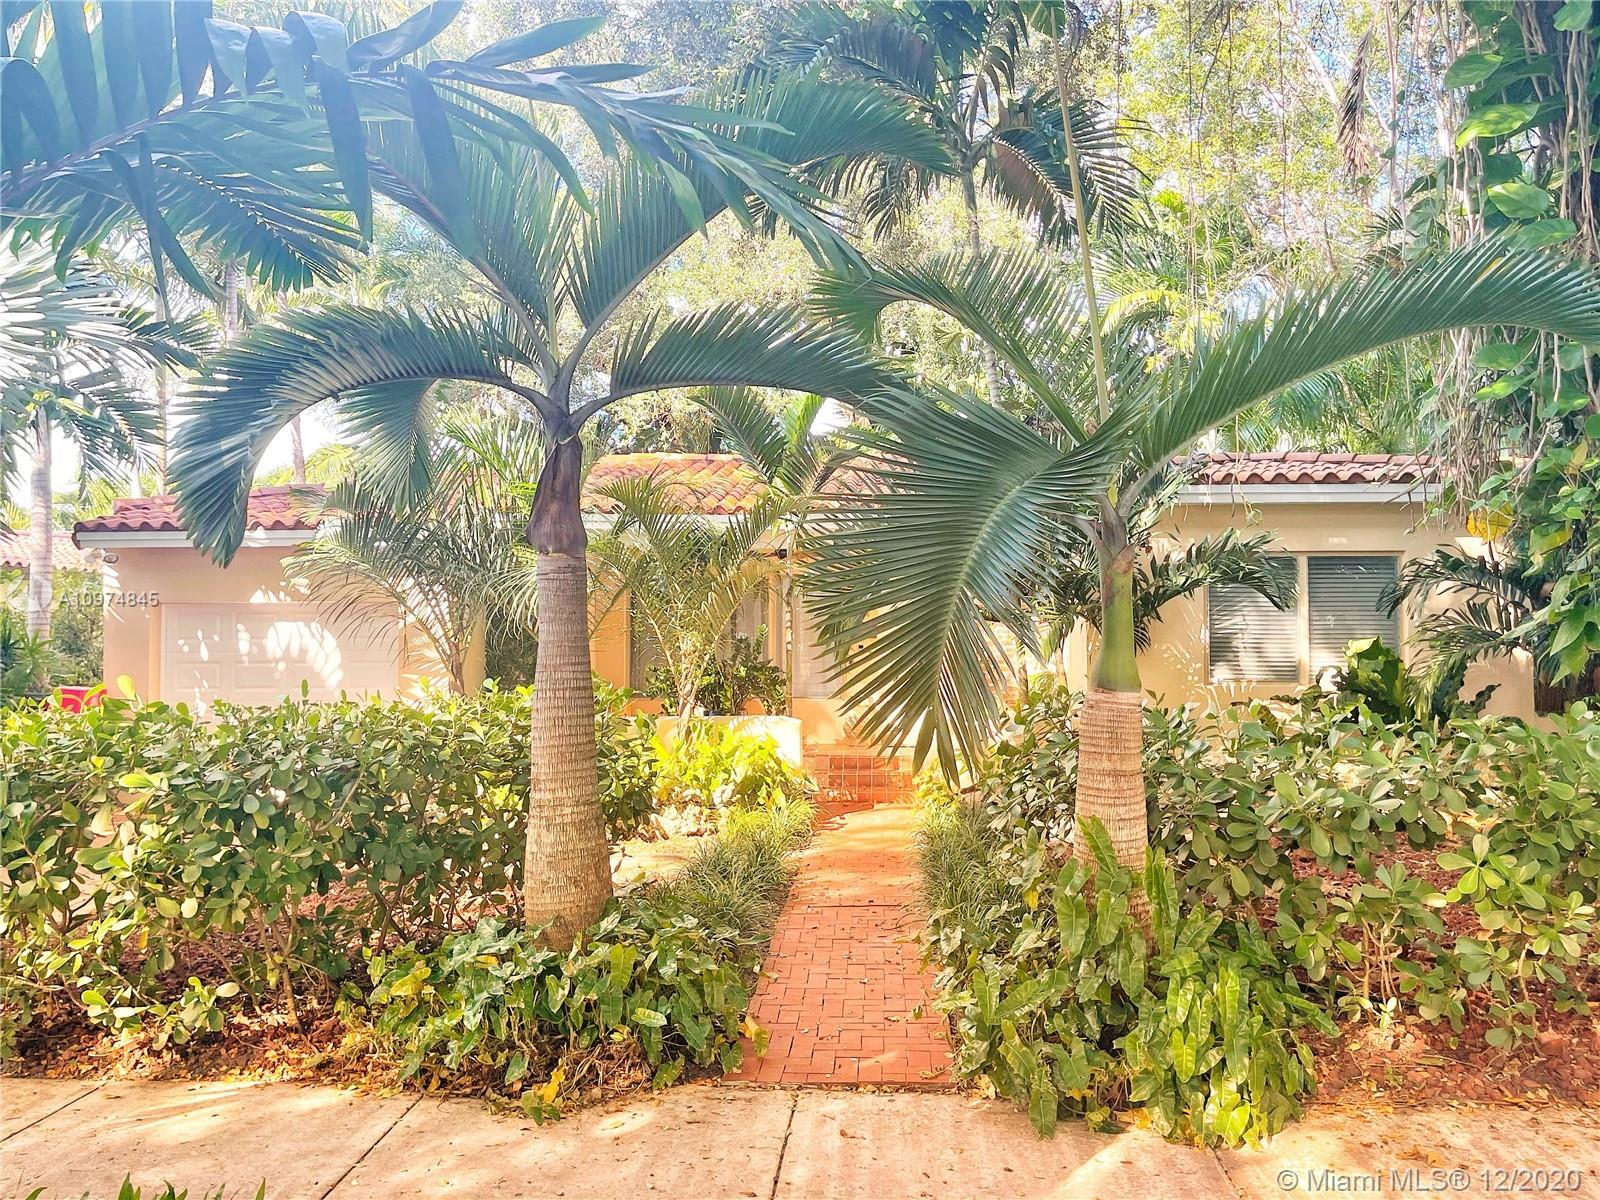 South Miami - 441 Sansovino Ave, Coral Gables, FL 33146